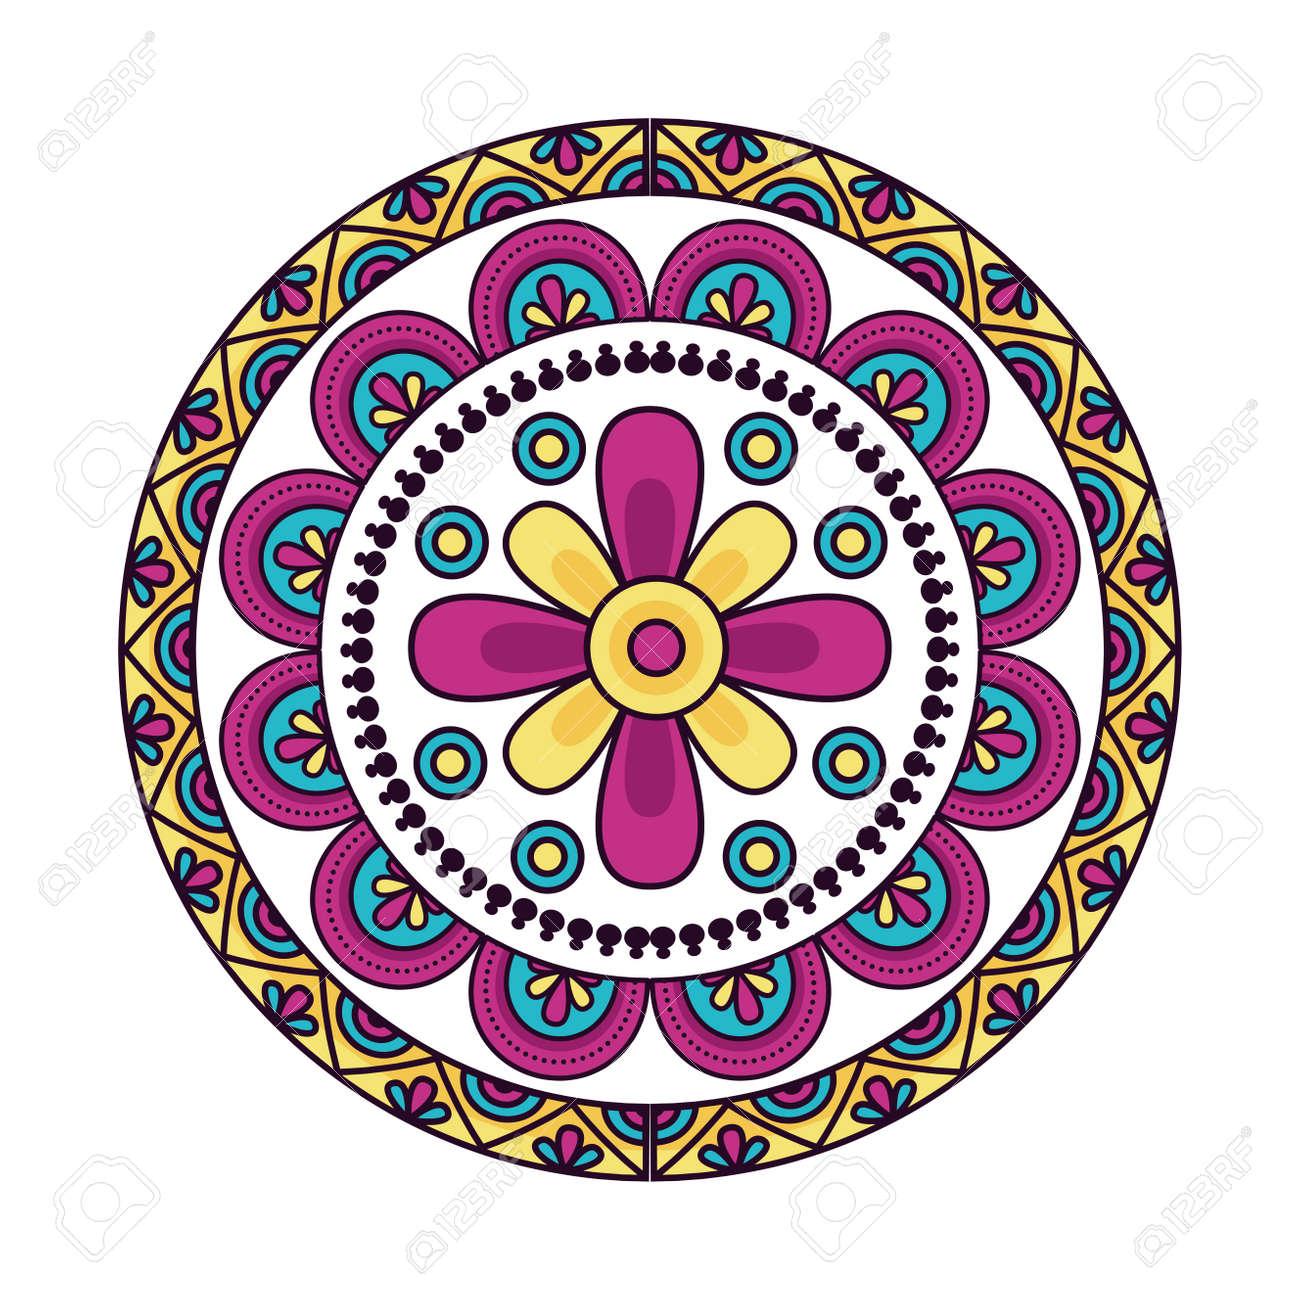 Mandale design, Bohemic ornament meditation indian decoration ethnic arabic and mystical theme Vector illustration - 157670762